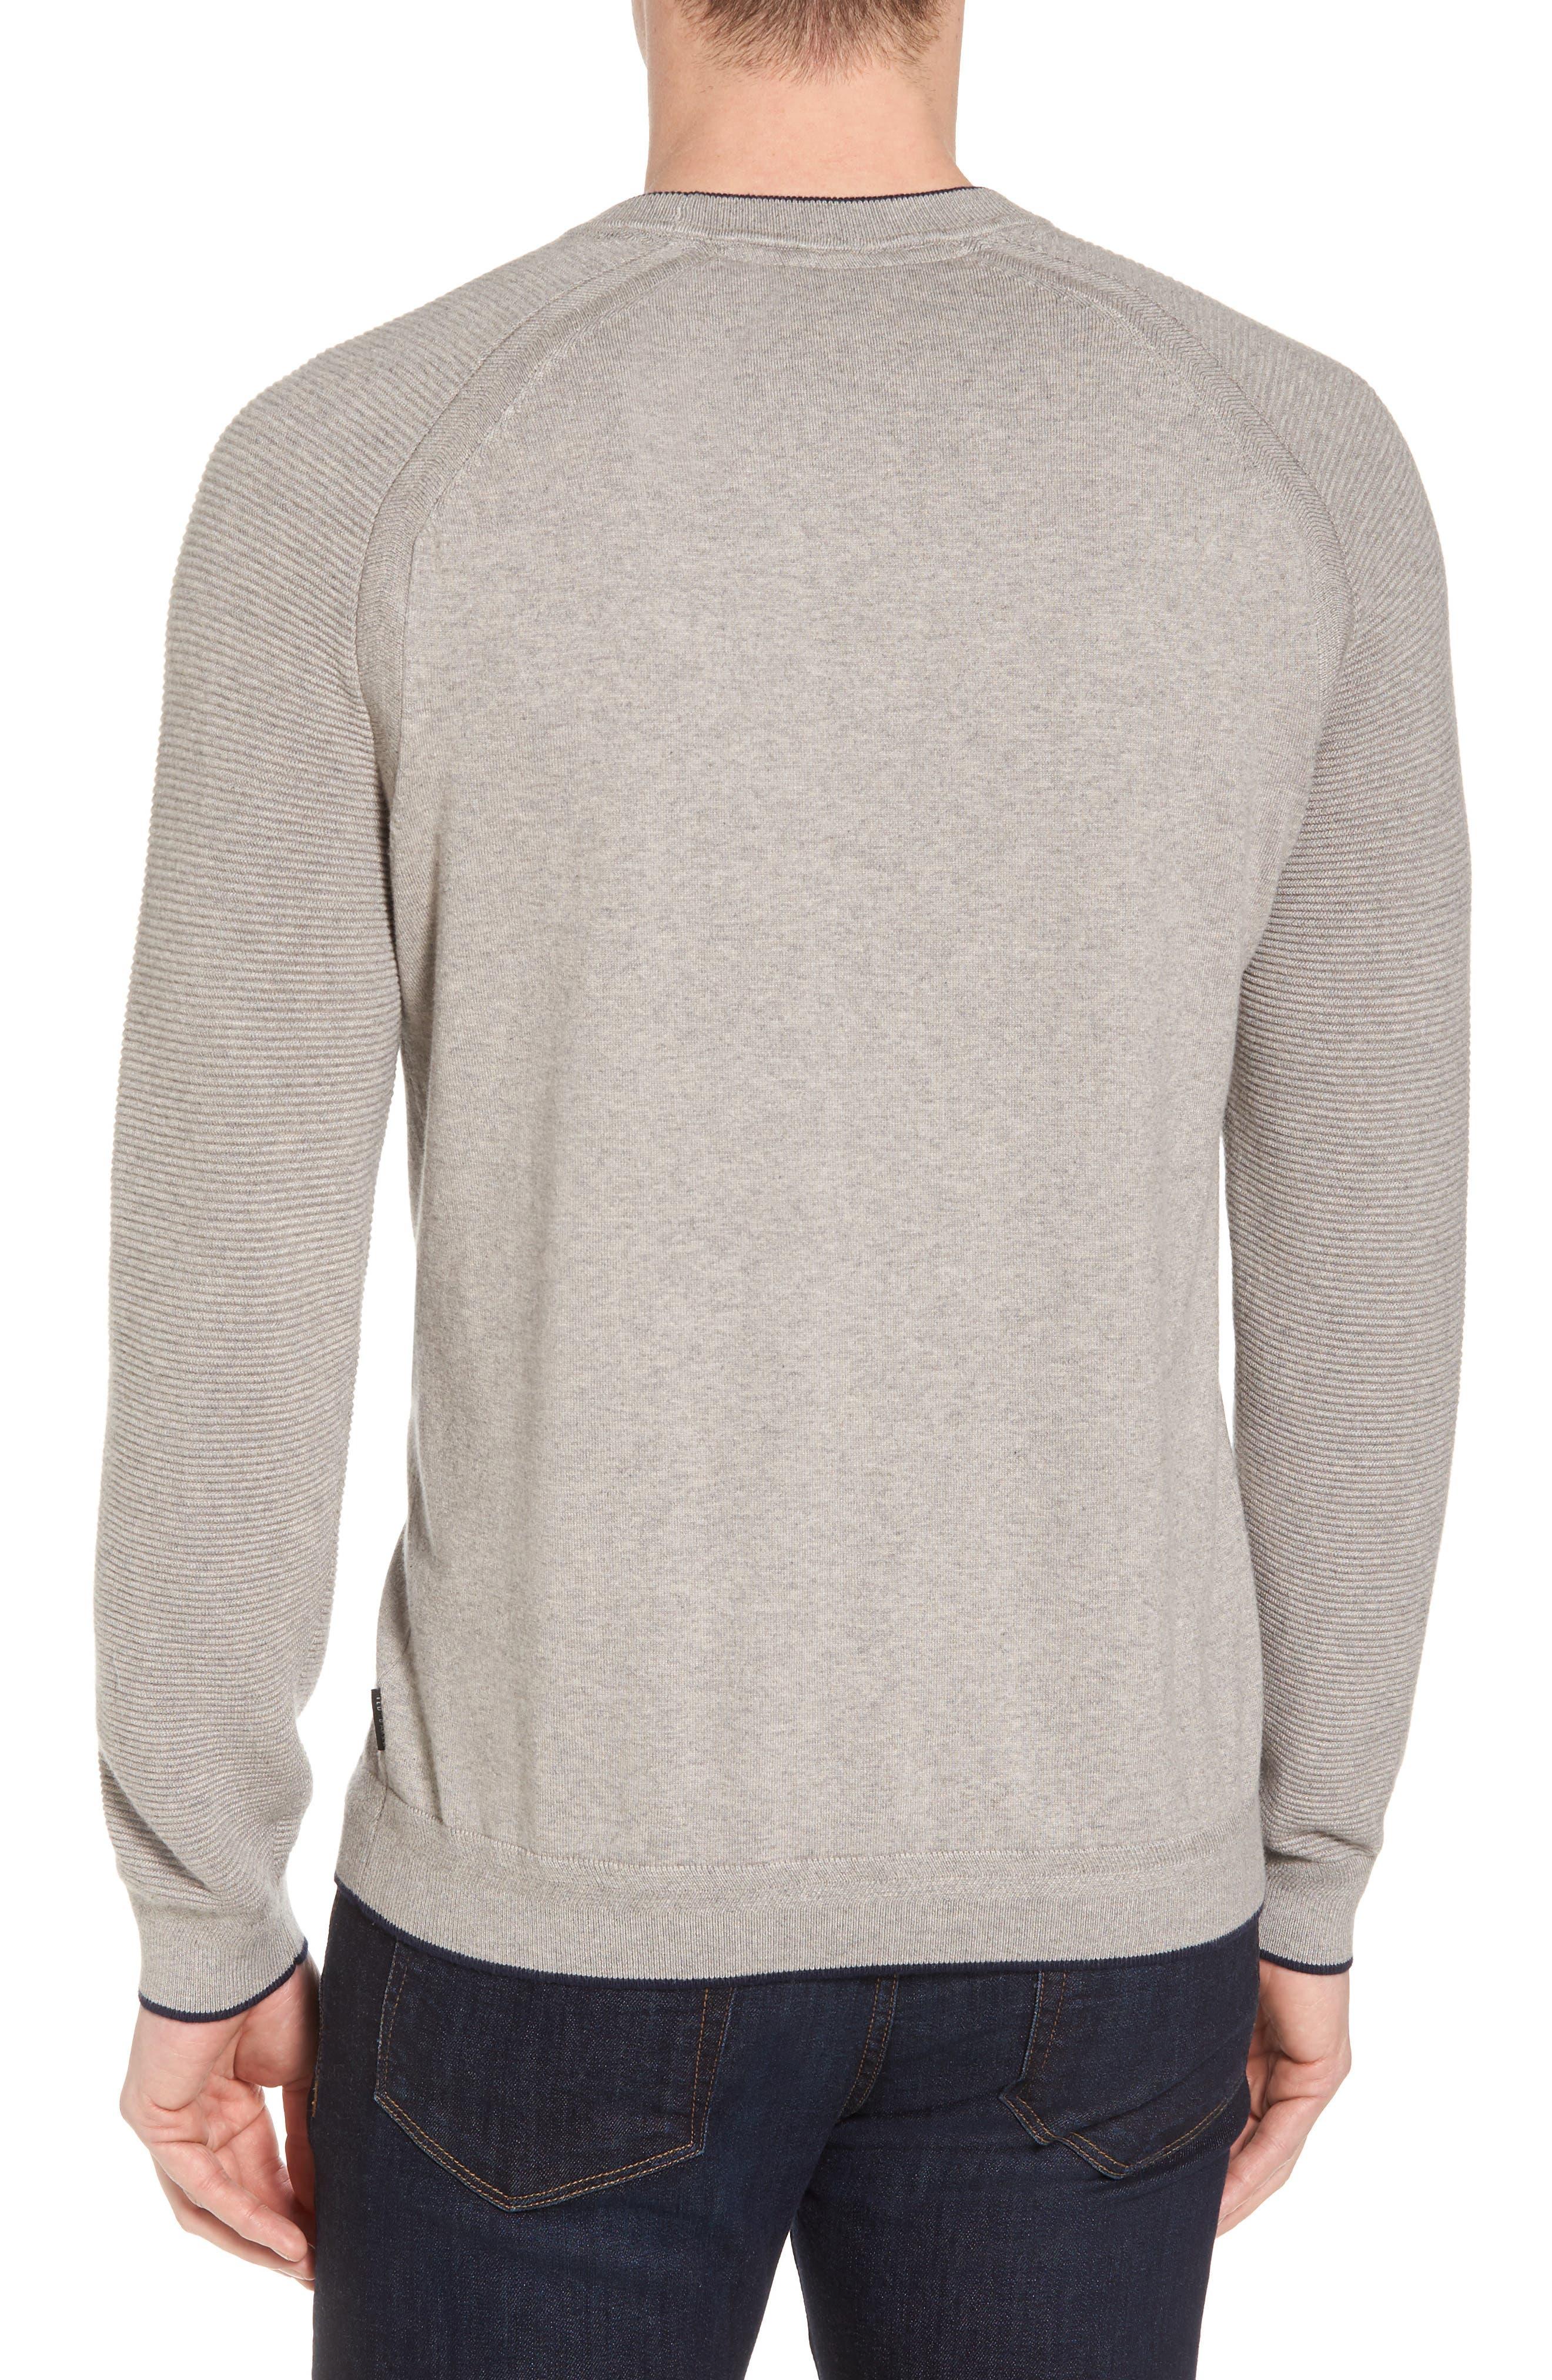 Kayfed Rib Sleeve Sweater,                             Alternate thumbnail 2, color,                             Grey Marl